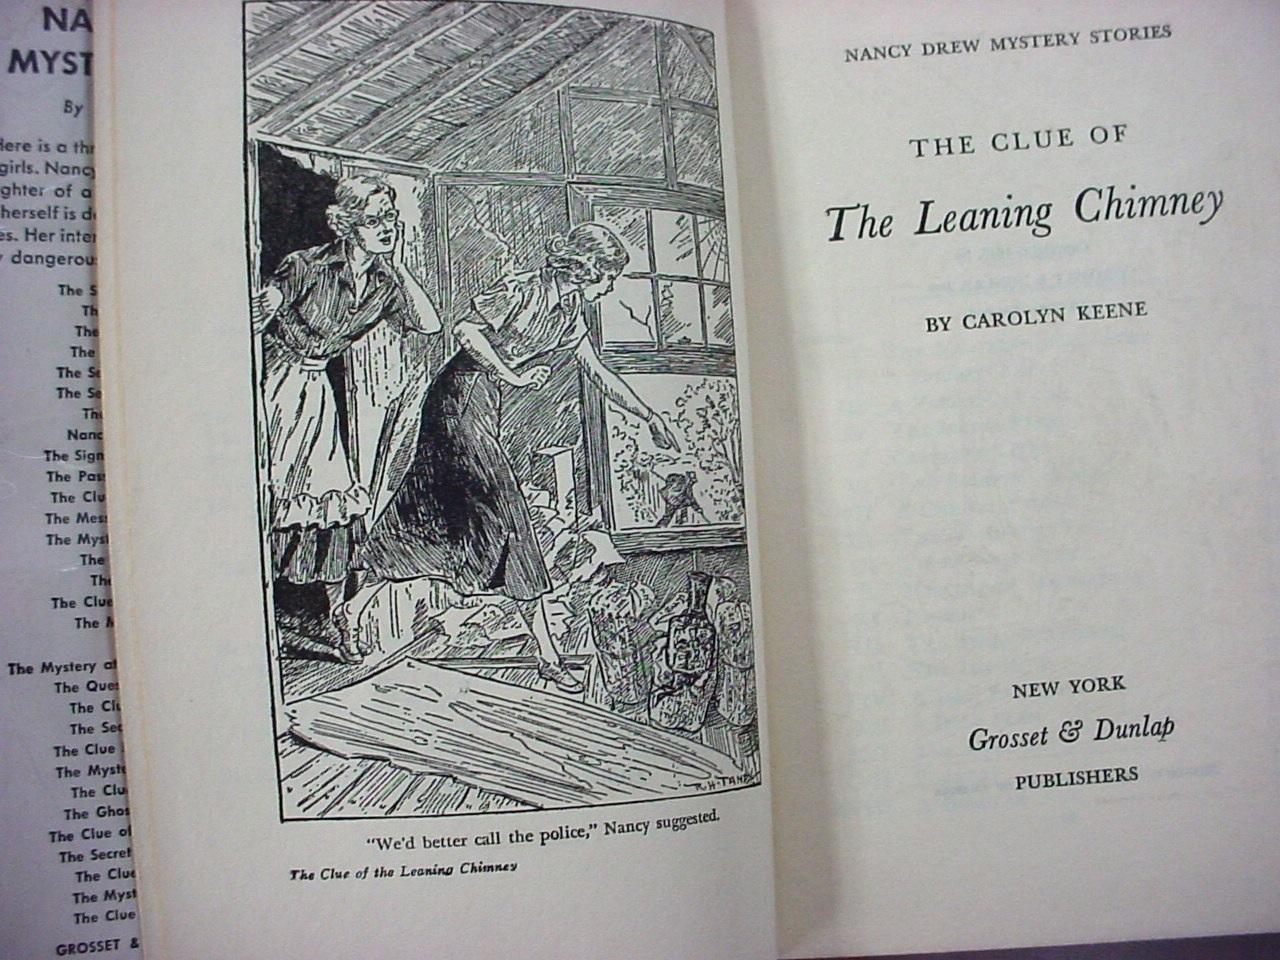 Nancy Drew The Clue of the Leaning Chimney 1953B-9 hcdj Carolyn Keene no.26